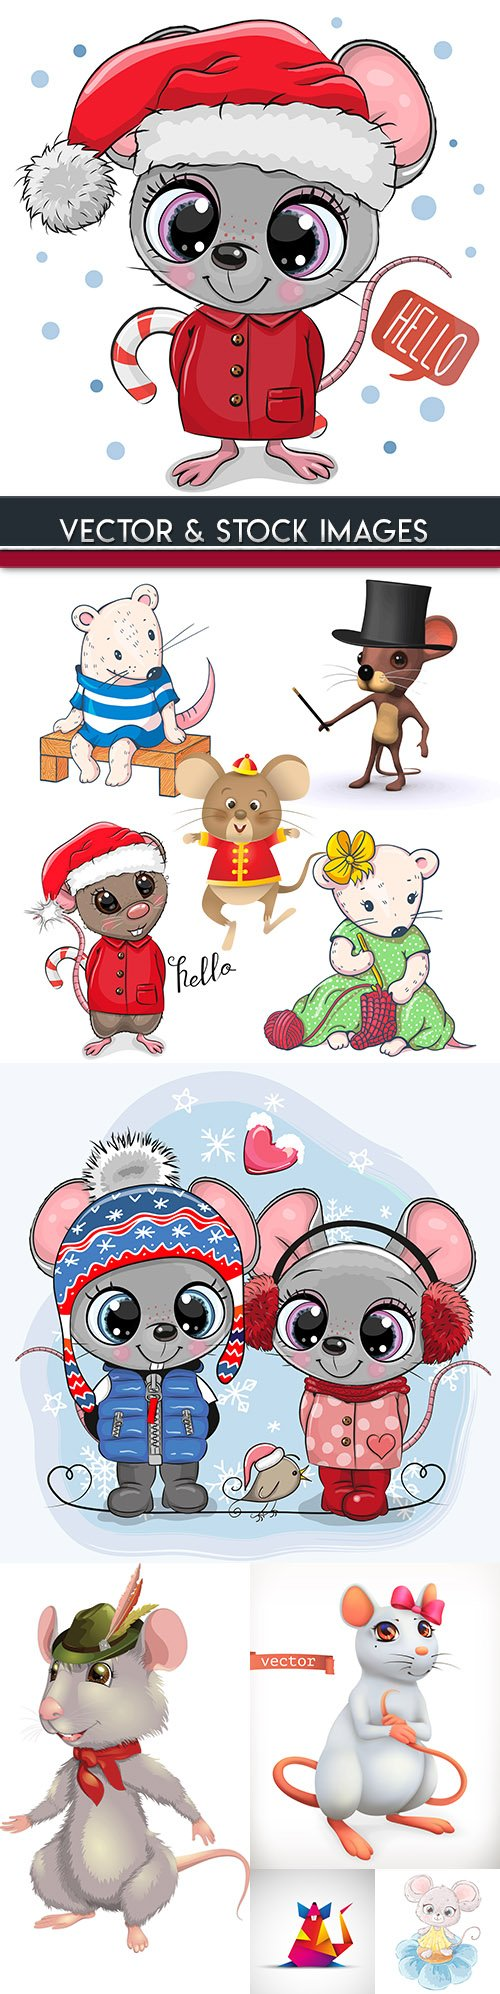 Rat cartoon symbol of New Year 2020 illustration 2